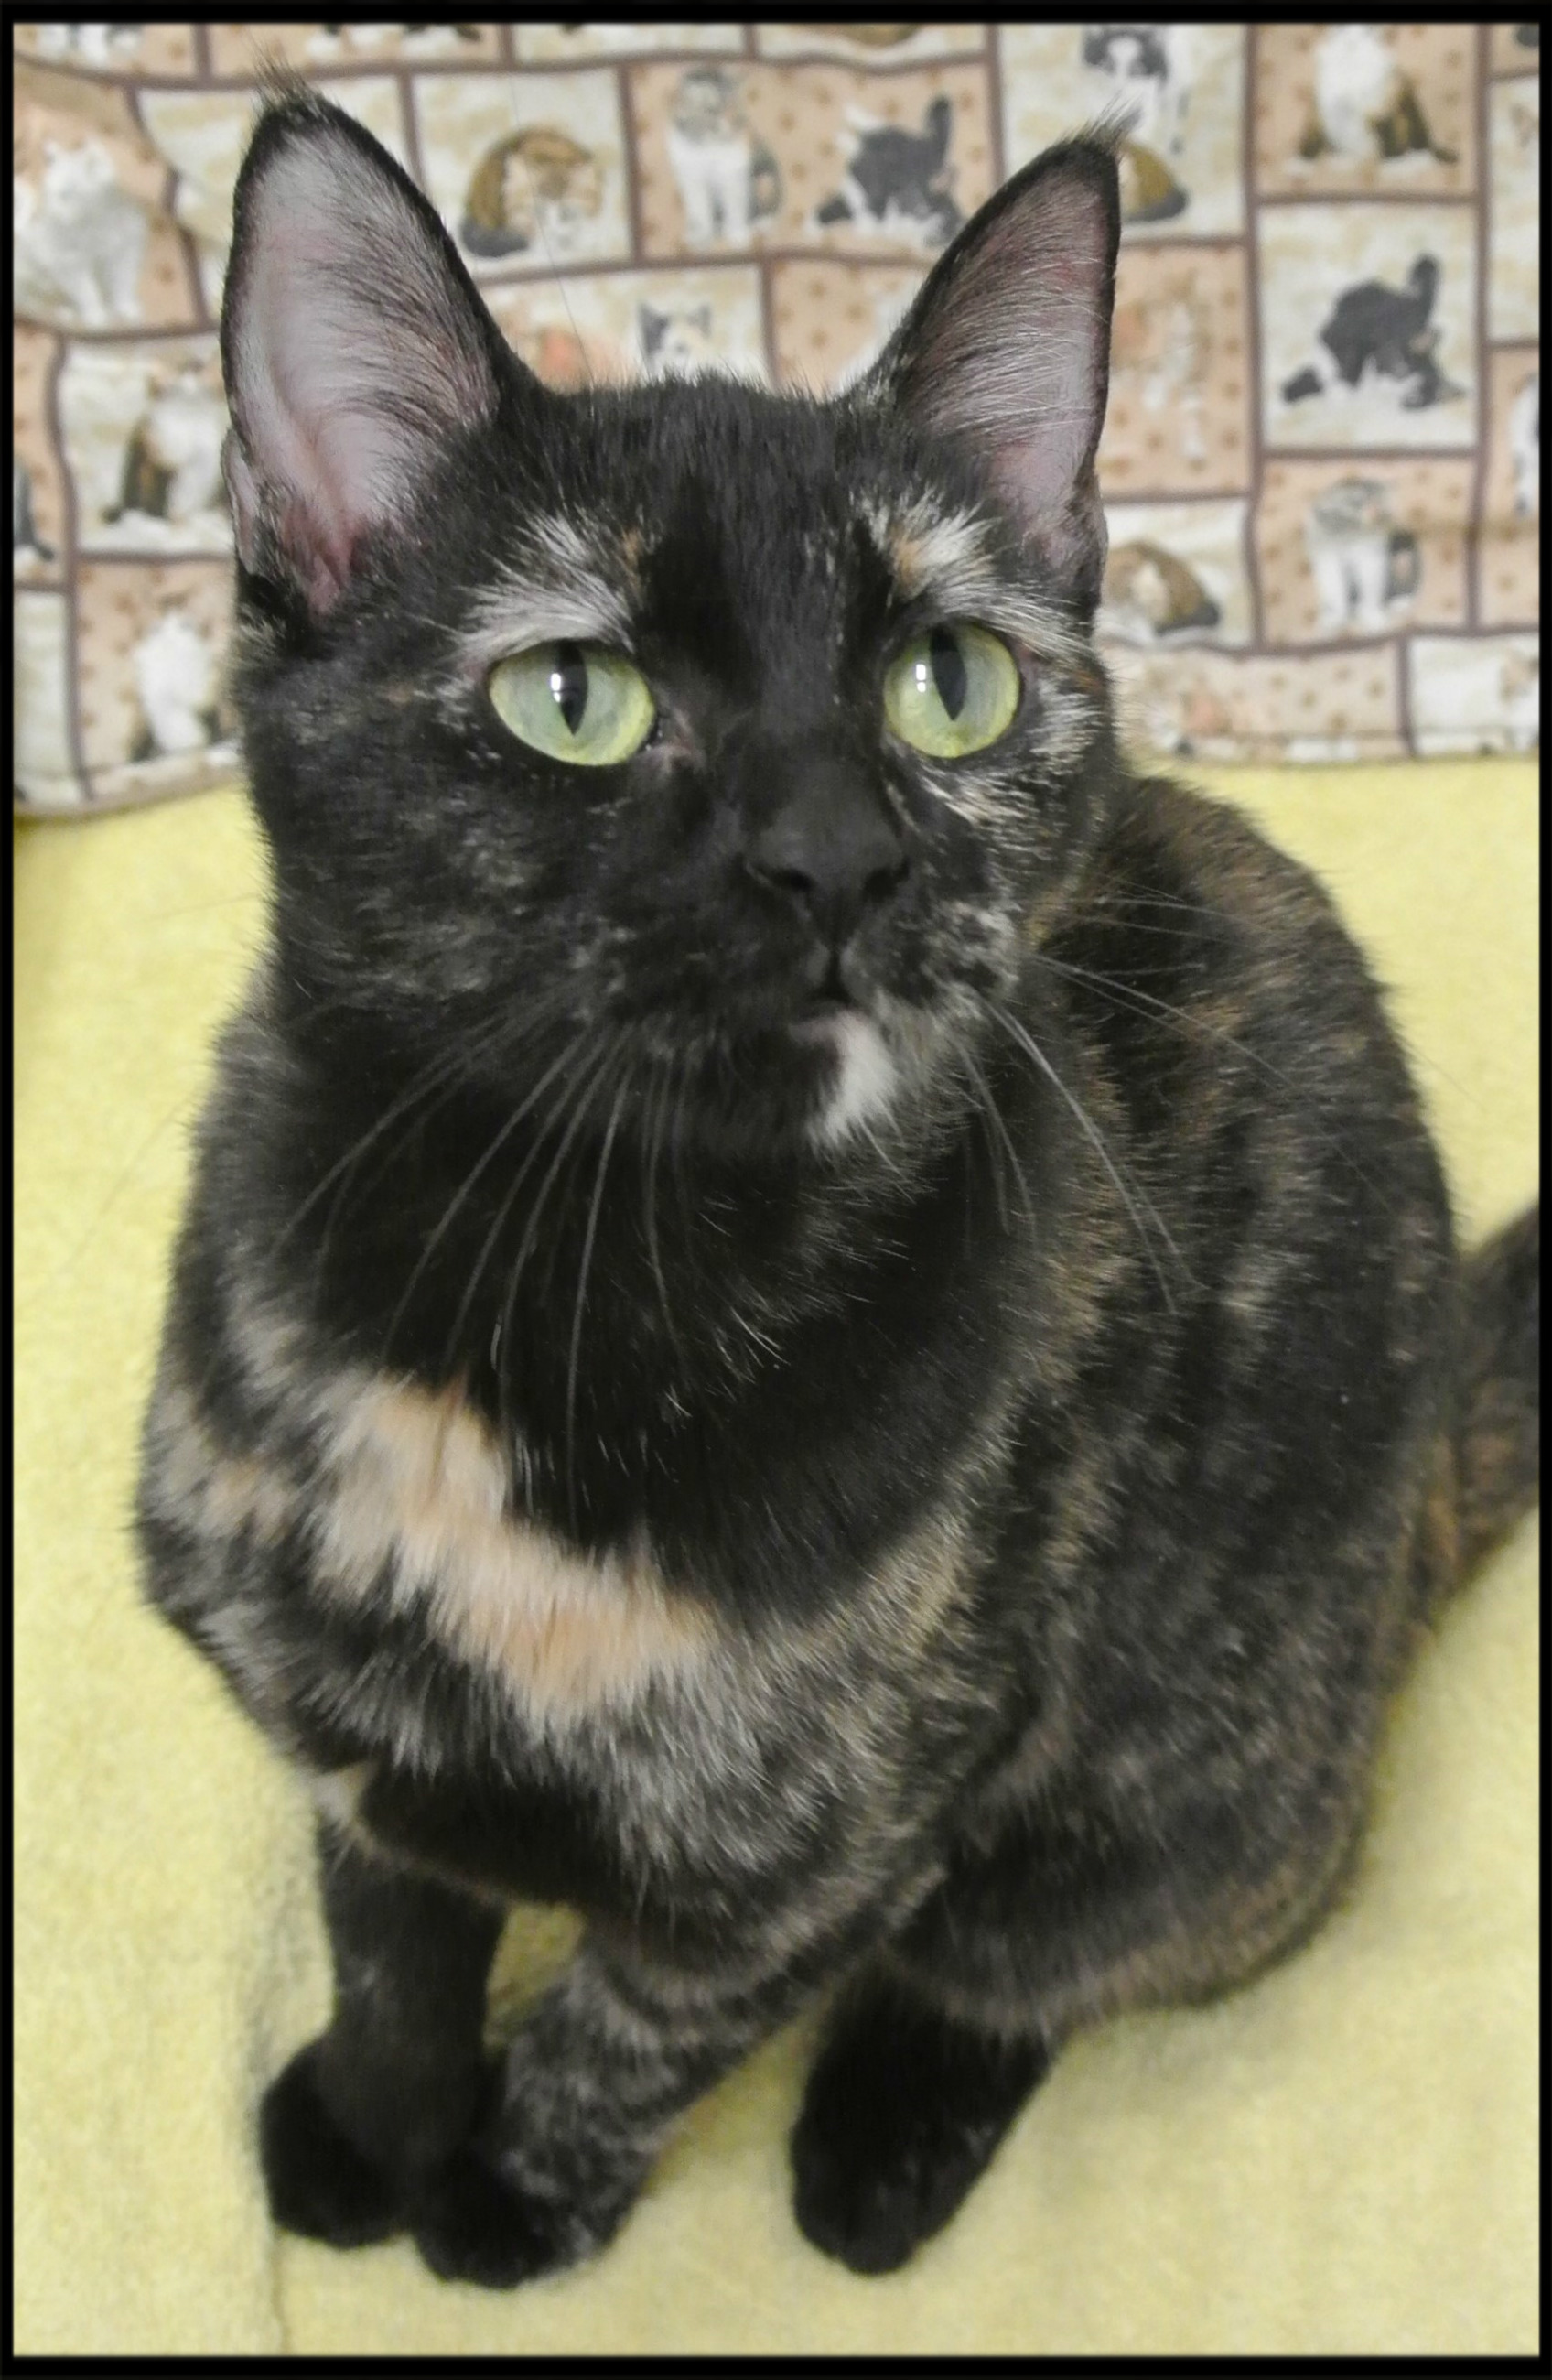 Cat – Portage Animal Welfare Society Inc